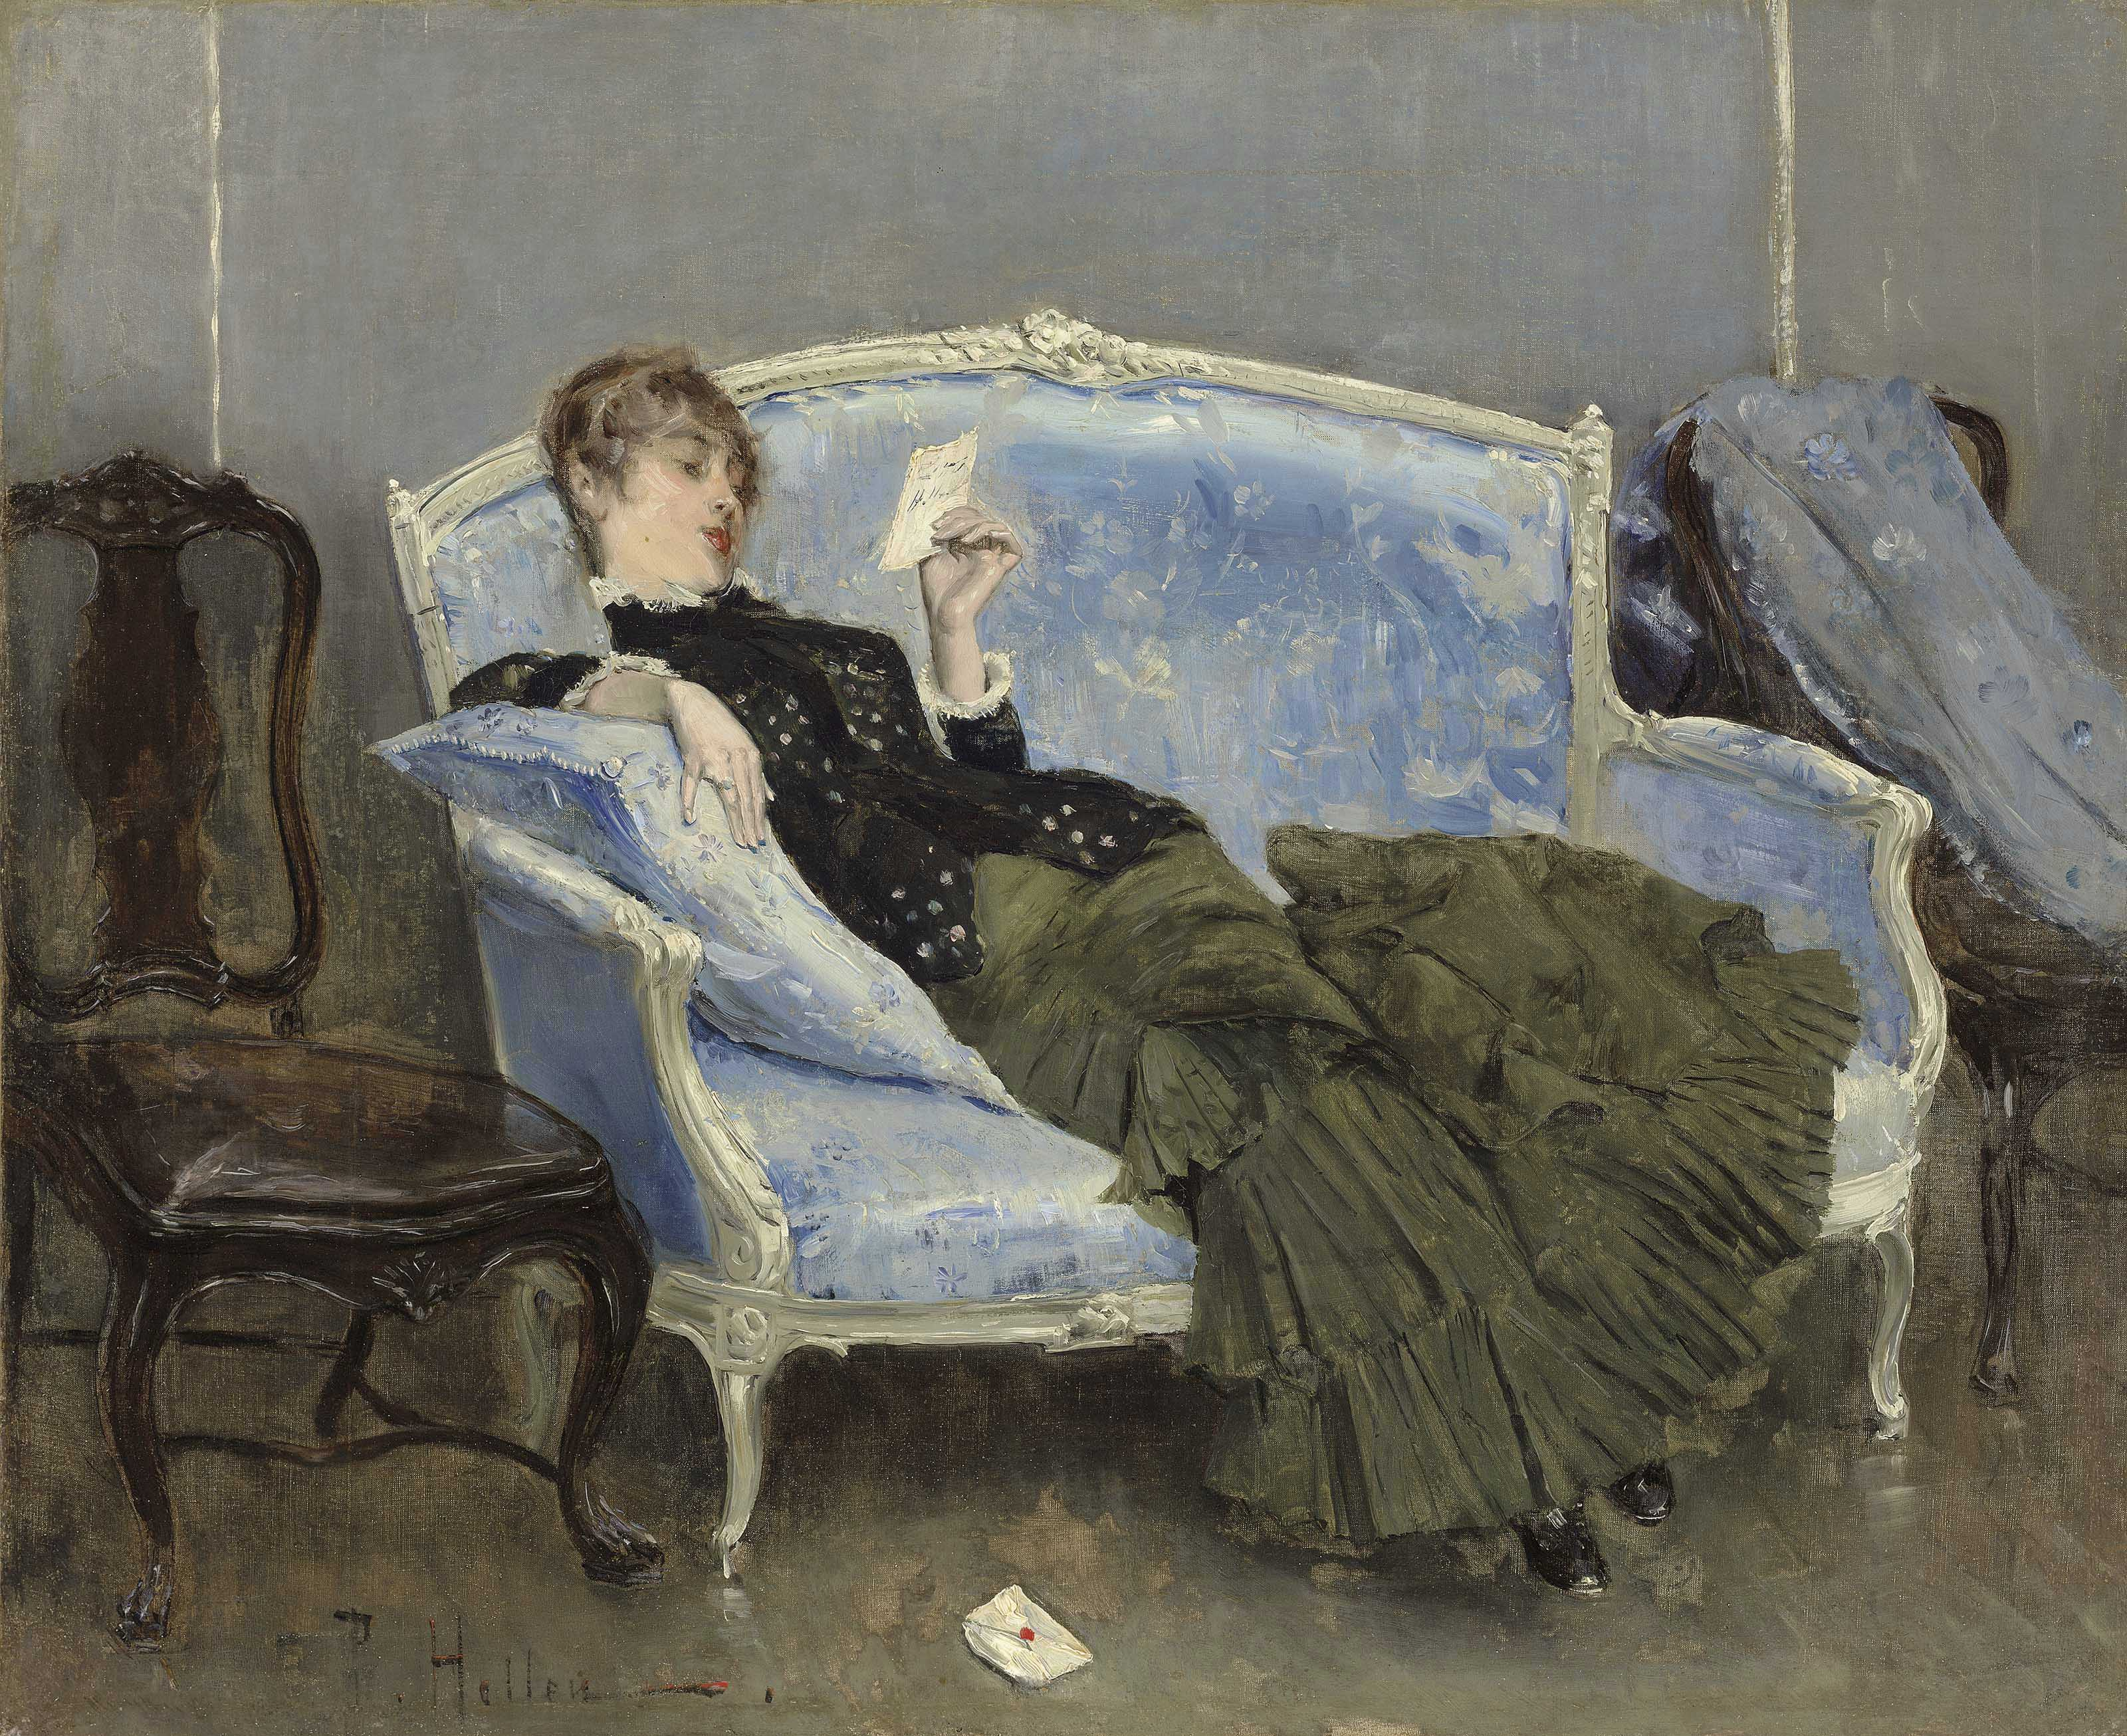 Paul-César Helleu (French, 185